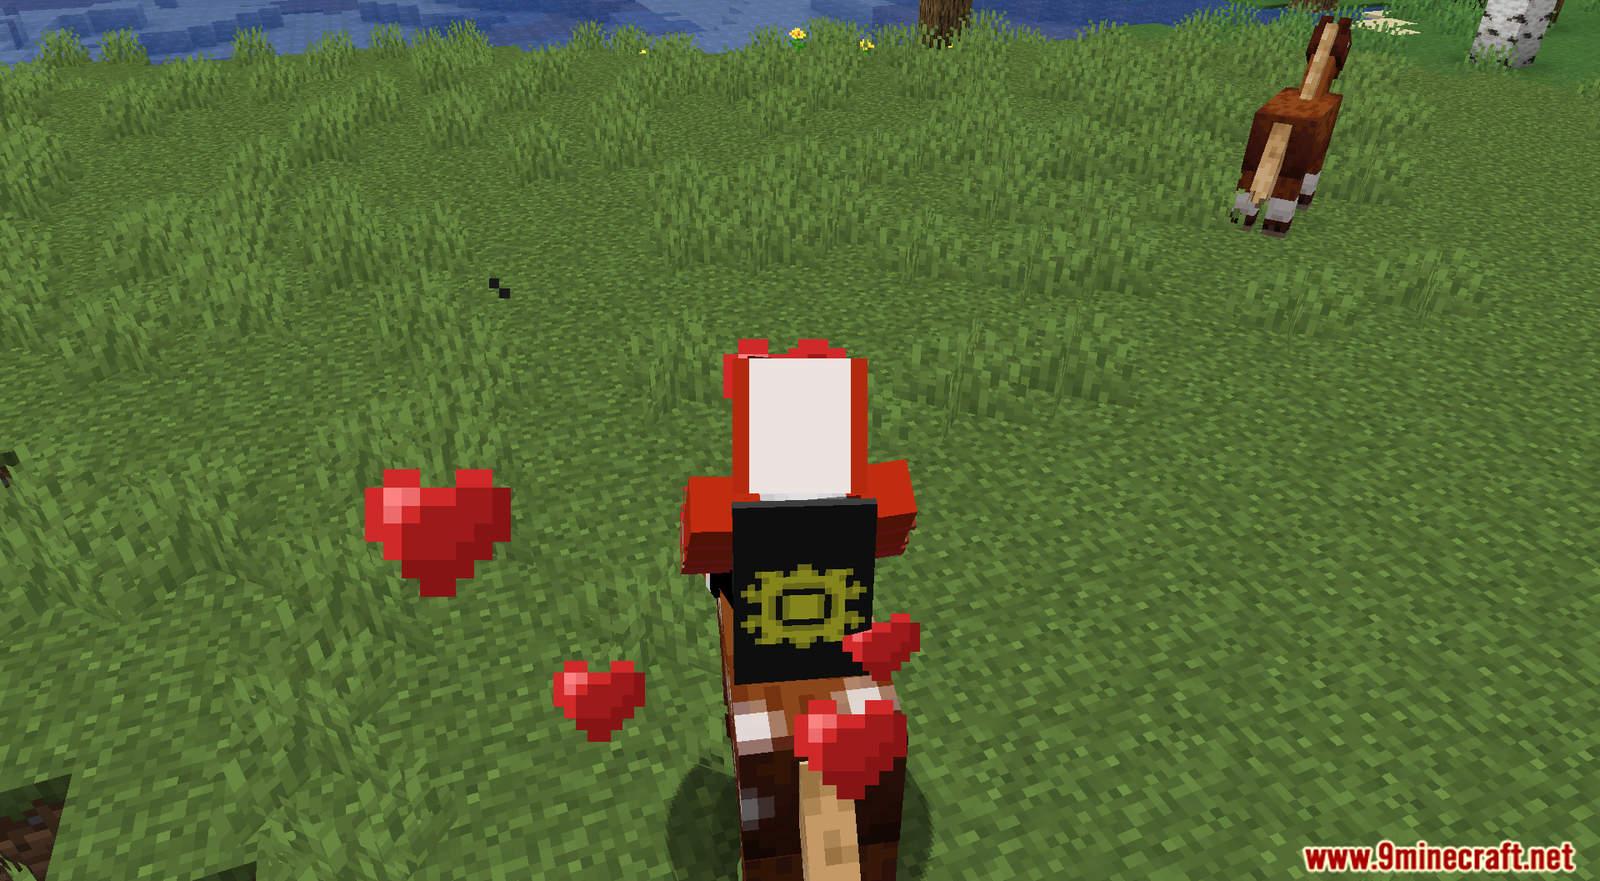 Horse Armor Crafting Data Pack Screenshots (3)